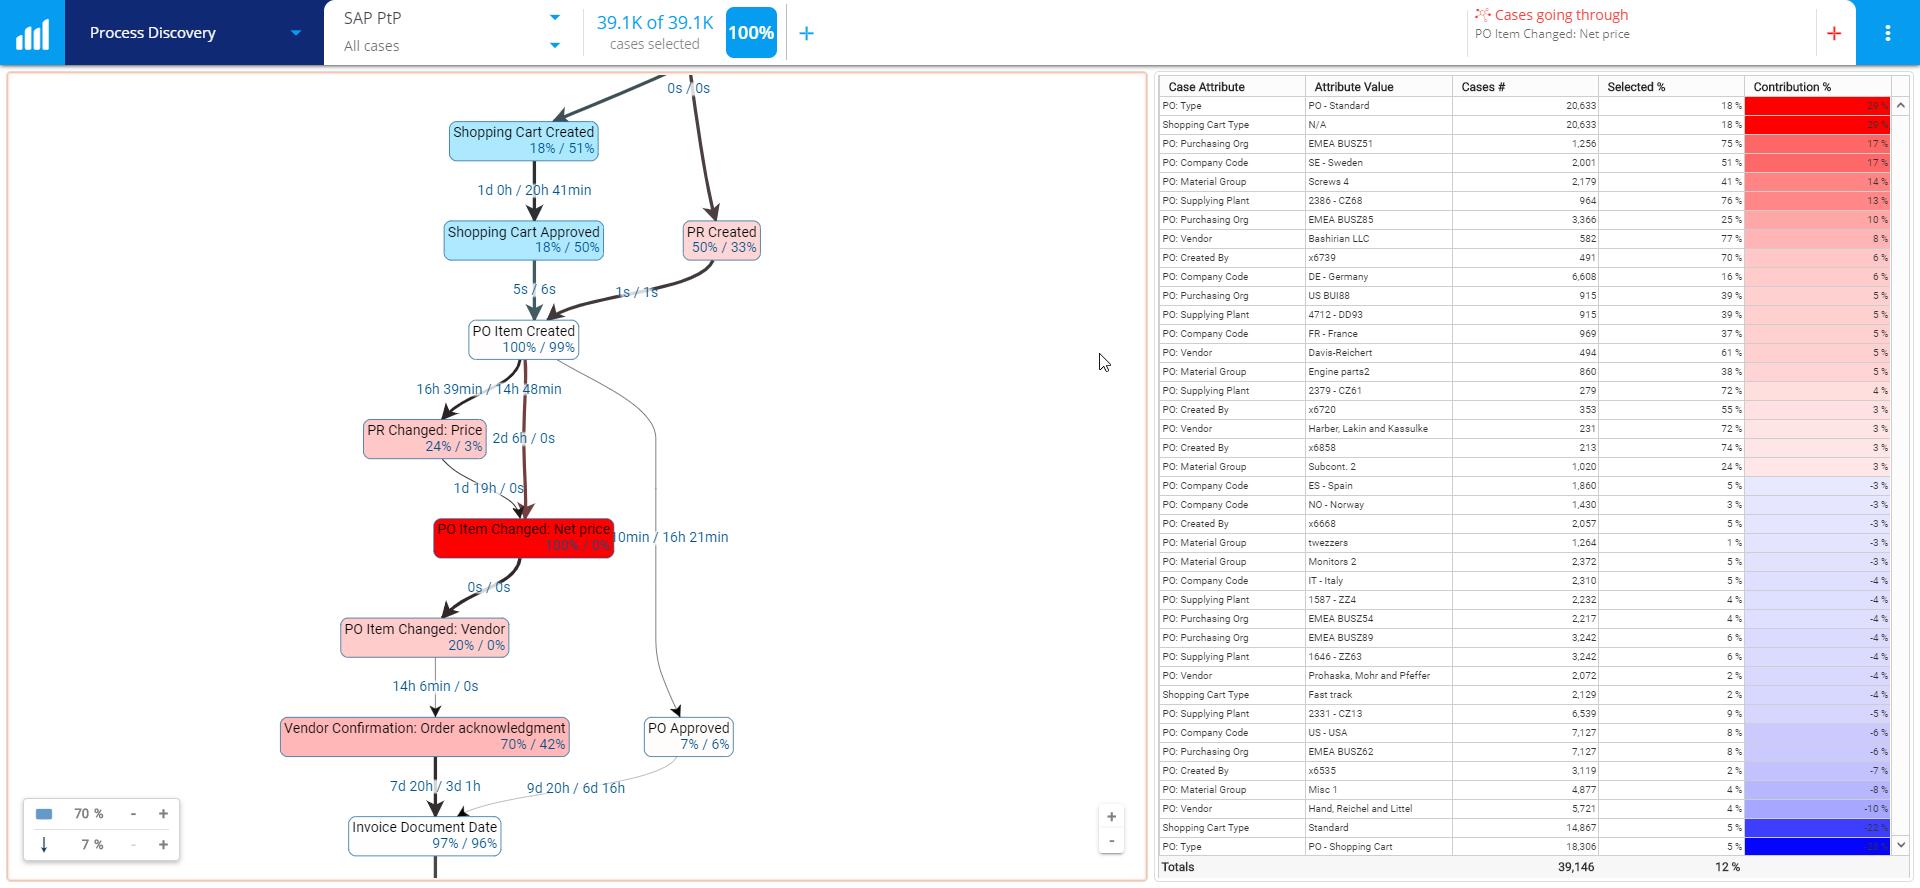 QPR ProcessAnalyzer - Root Causes SAP P2P